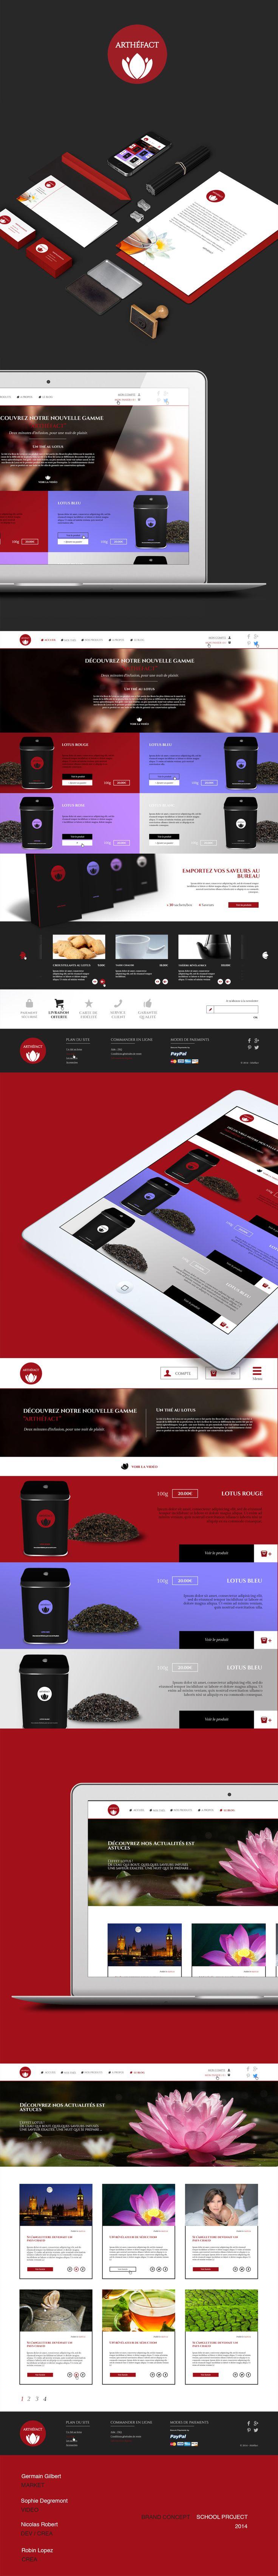 Brand concept - School project #webdesign #brand #tea #shop #packaging #ux #responsive